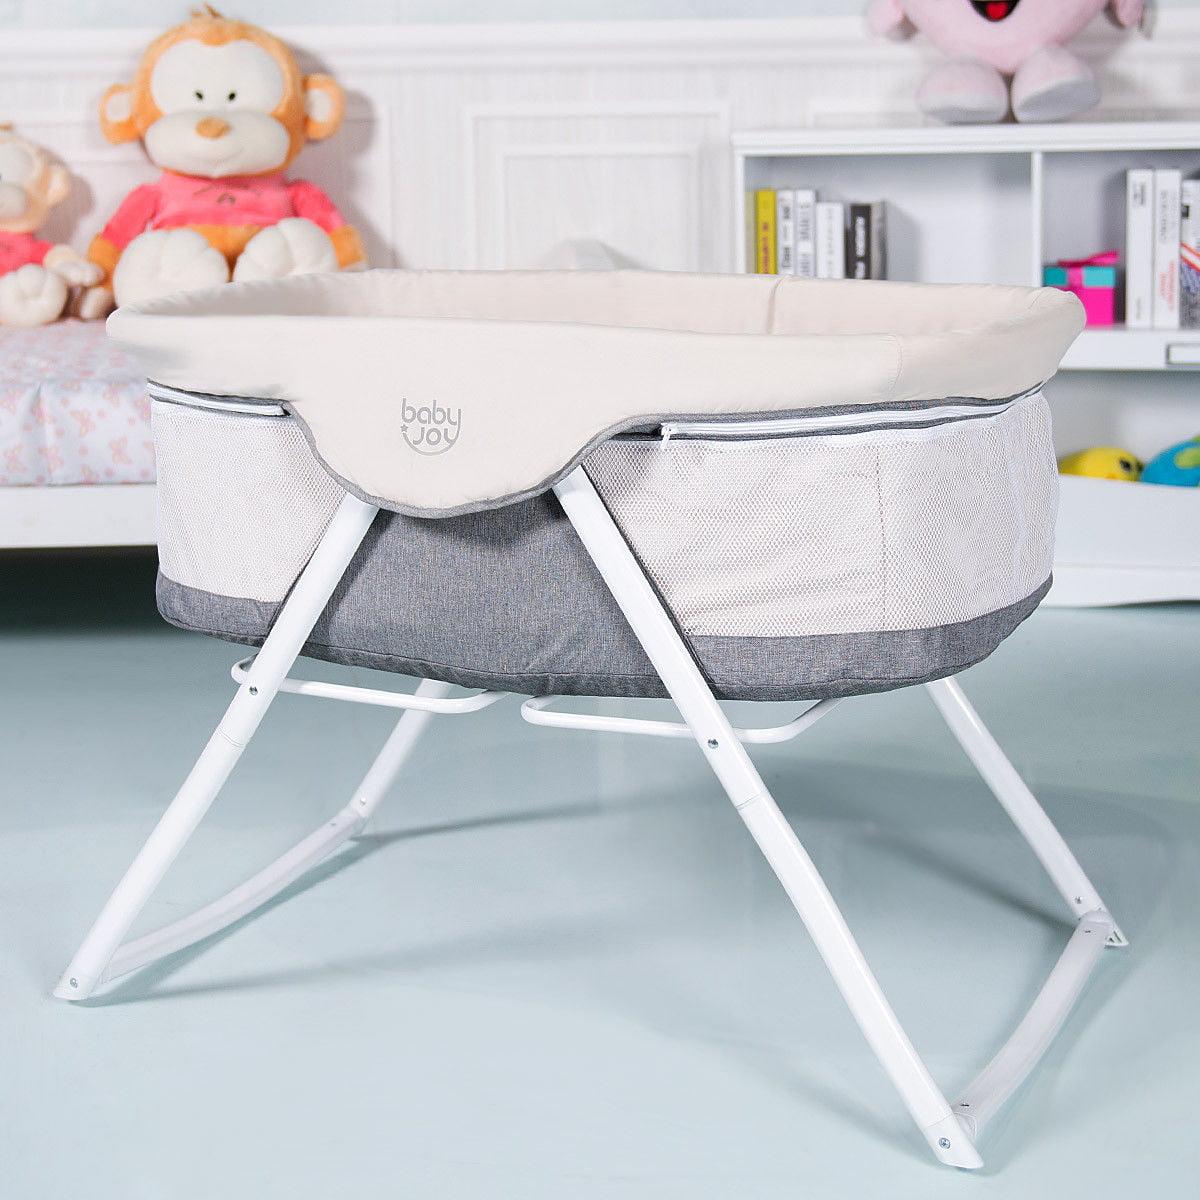 BabyJoy Foldaway Baby Bassinet Crib Newborn Rocking Sleeper Traveler Portable /Bag Gray